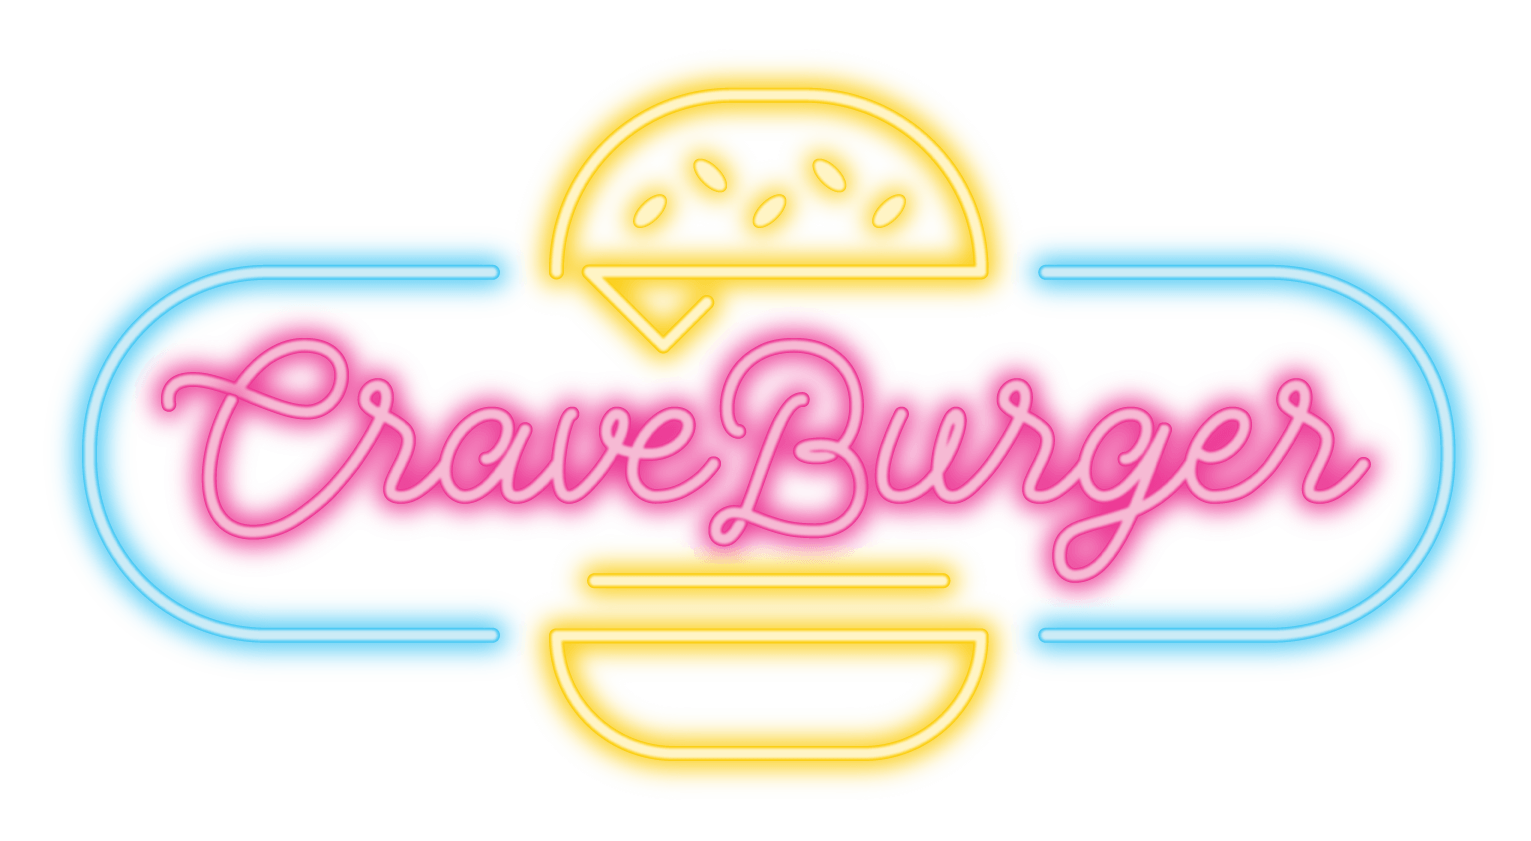 Crave Burger Logo